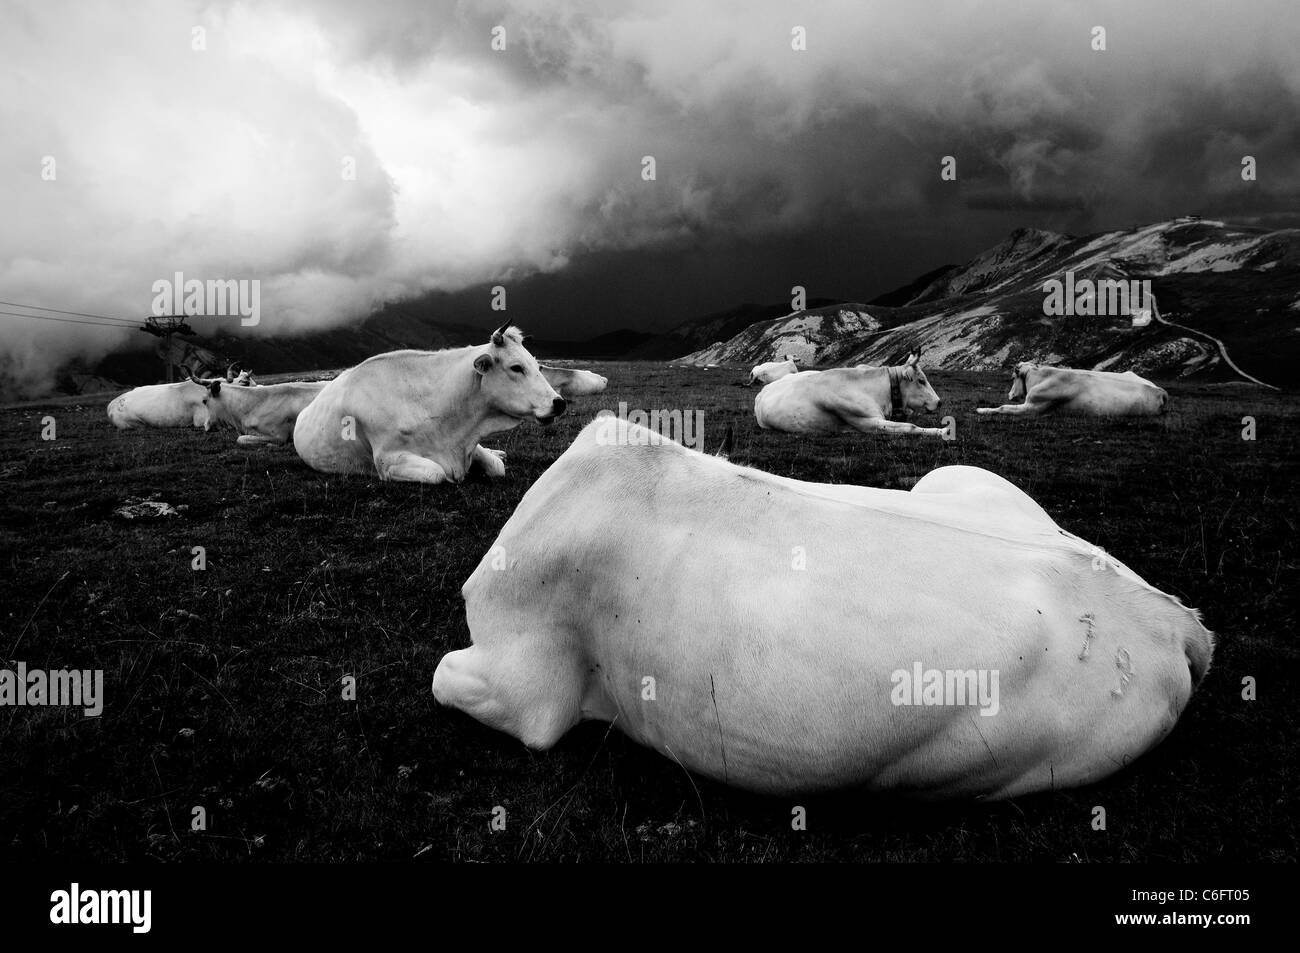 Weiße Kühe auf einem Berg, bewölkt Stockbild